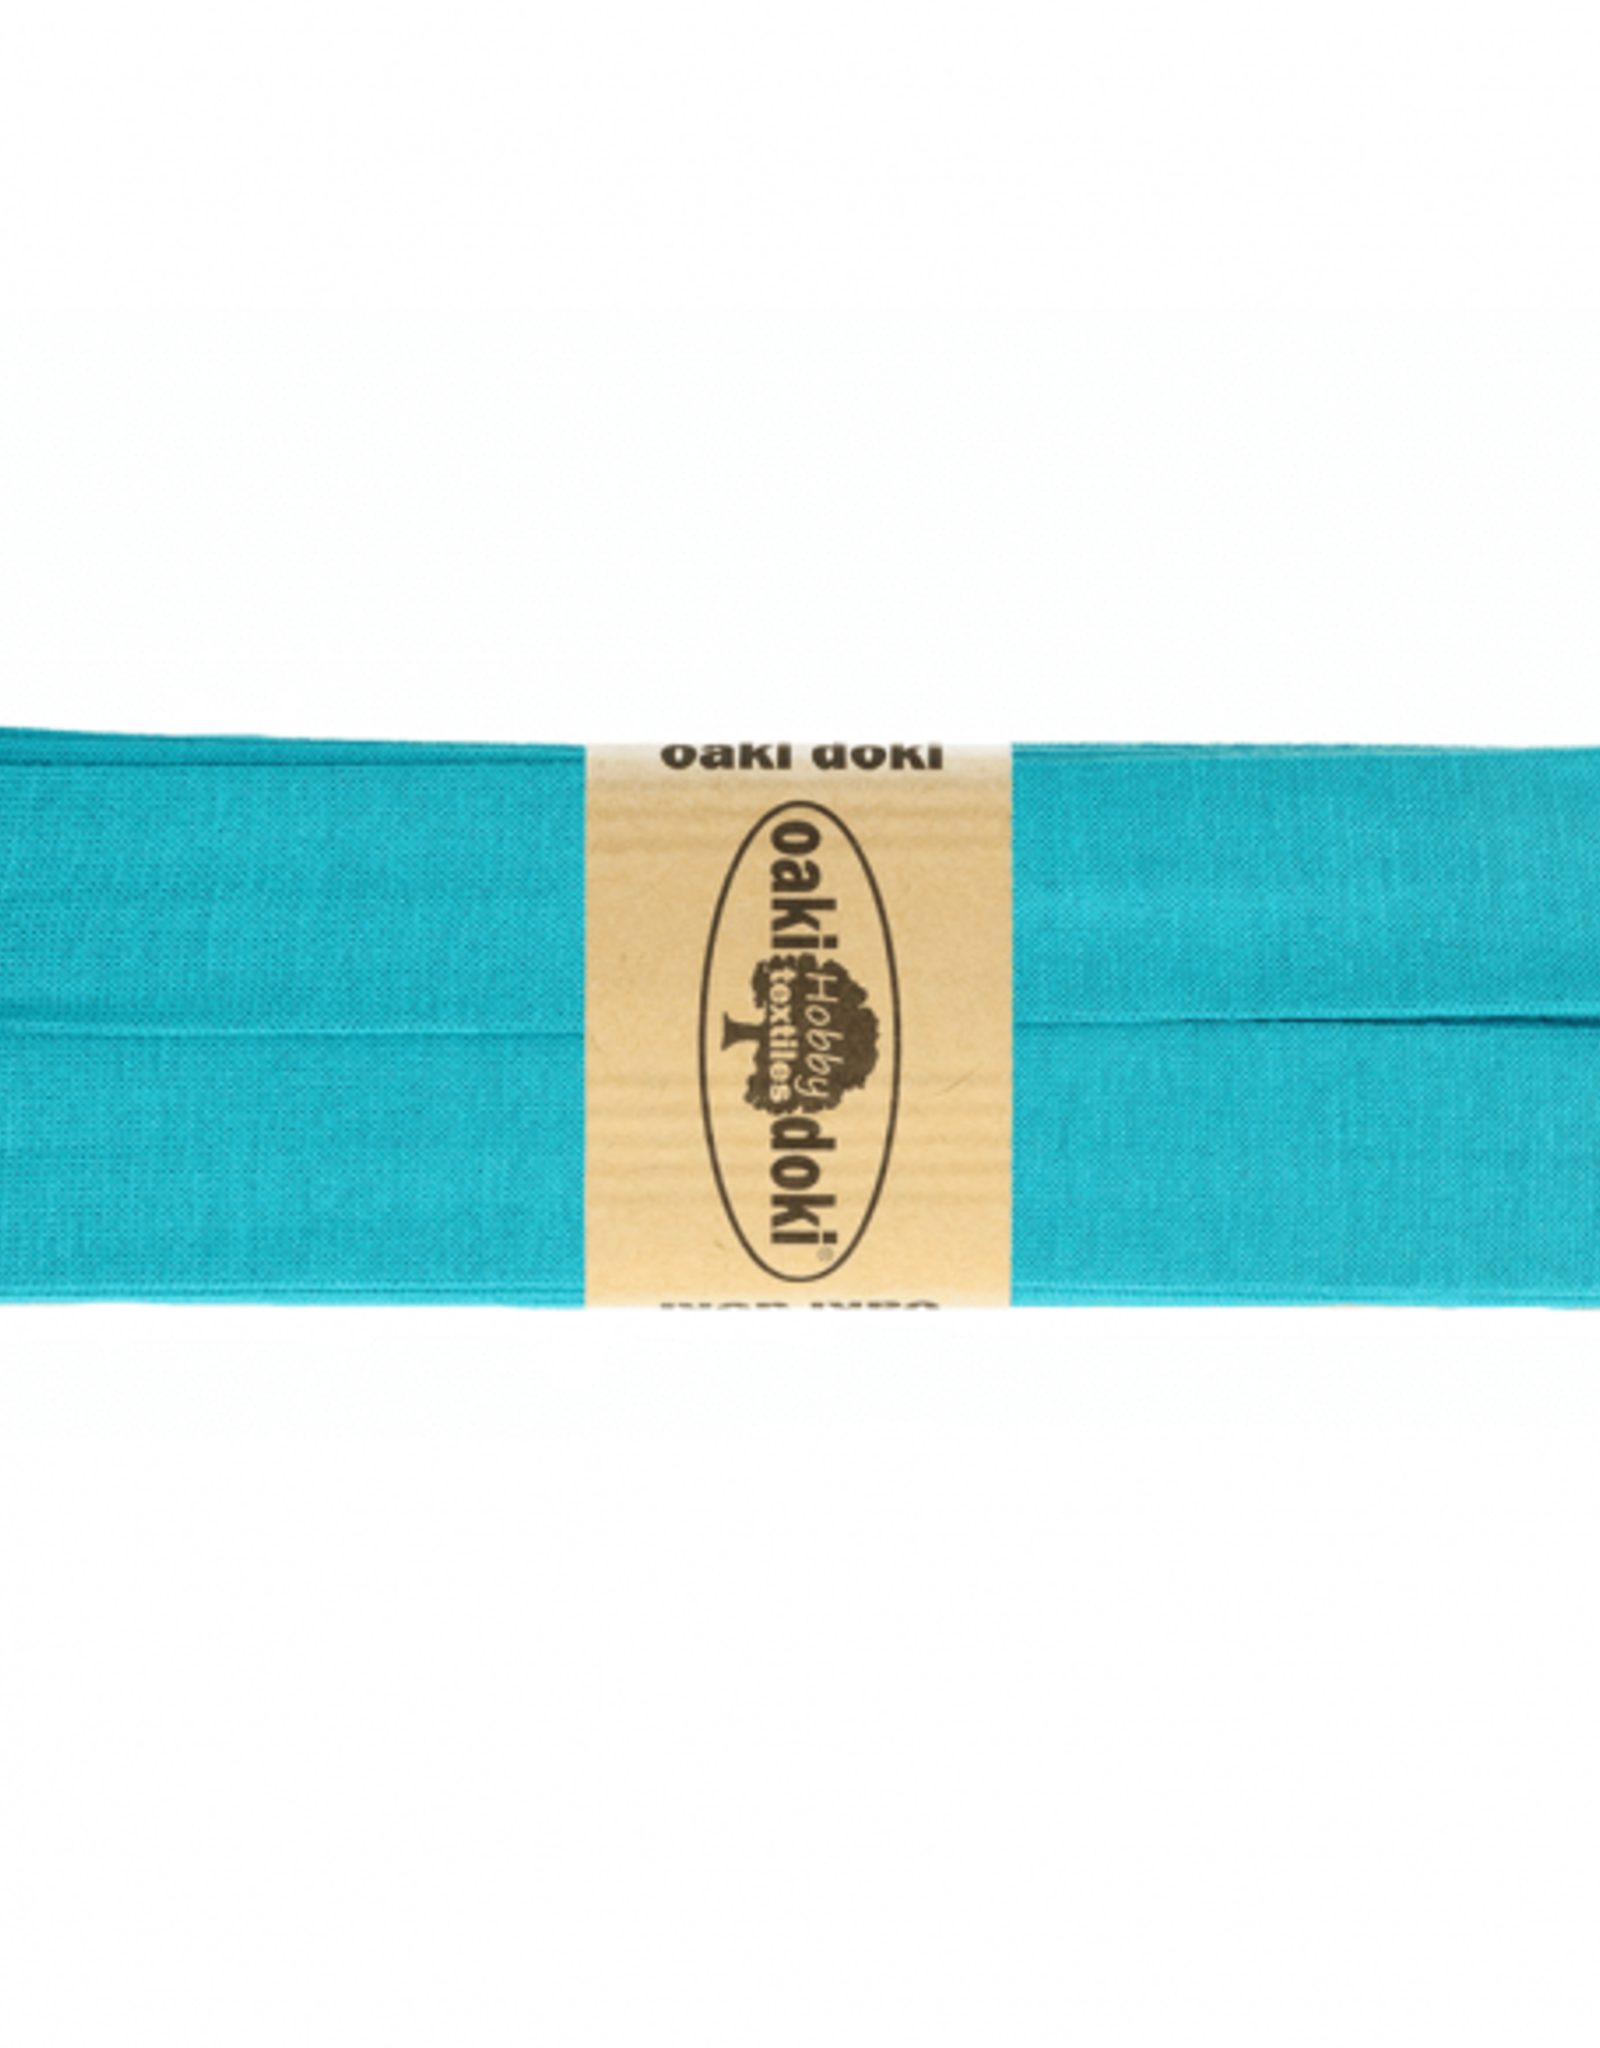 Oaki Doki Tricot de luxe jersey biaisband 20mm x 3m 472